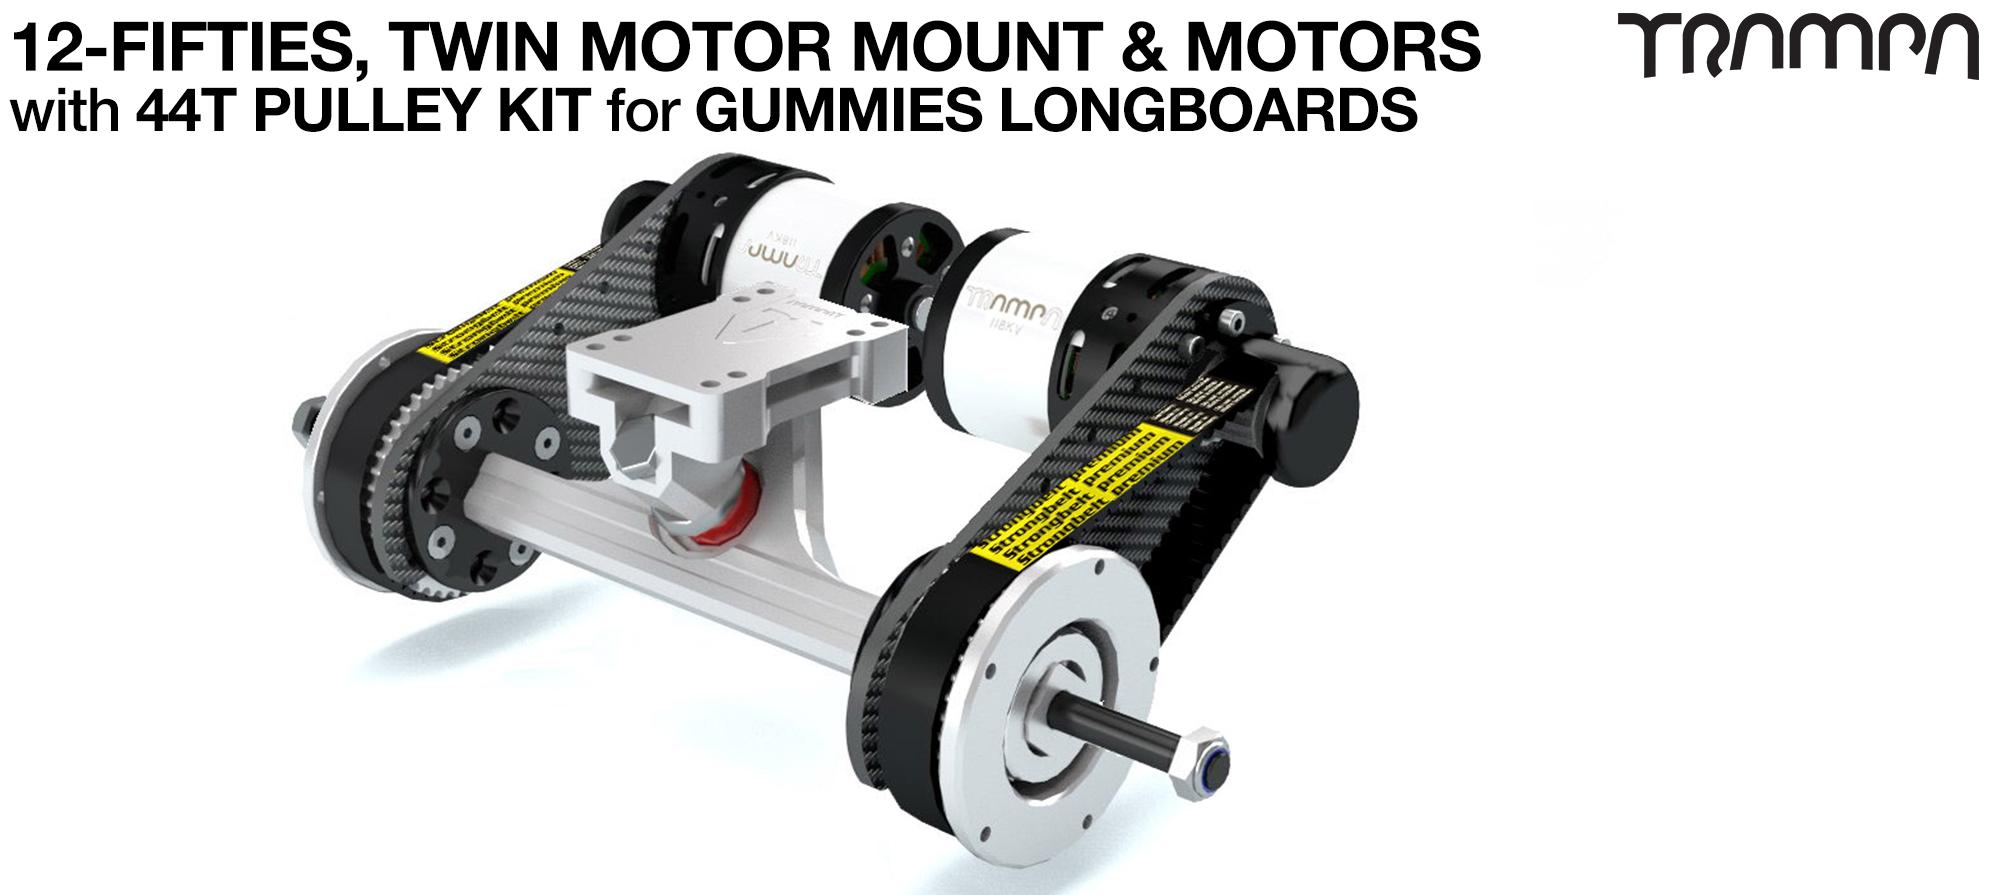 TWIN Original 12FiFties Motor mount & 44 Tooth Pulley Kit with MOTOR & 2x 12FiFties Trucks